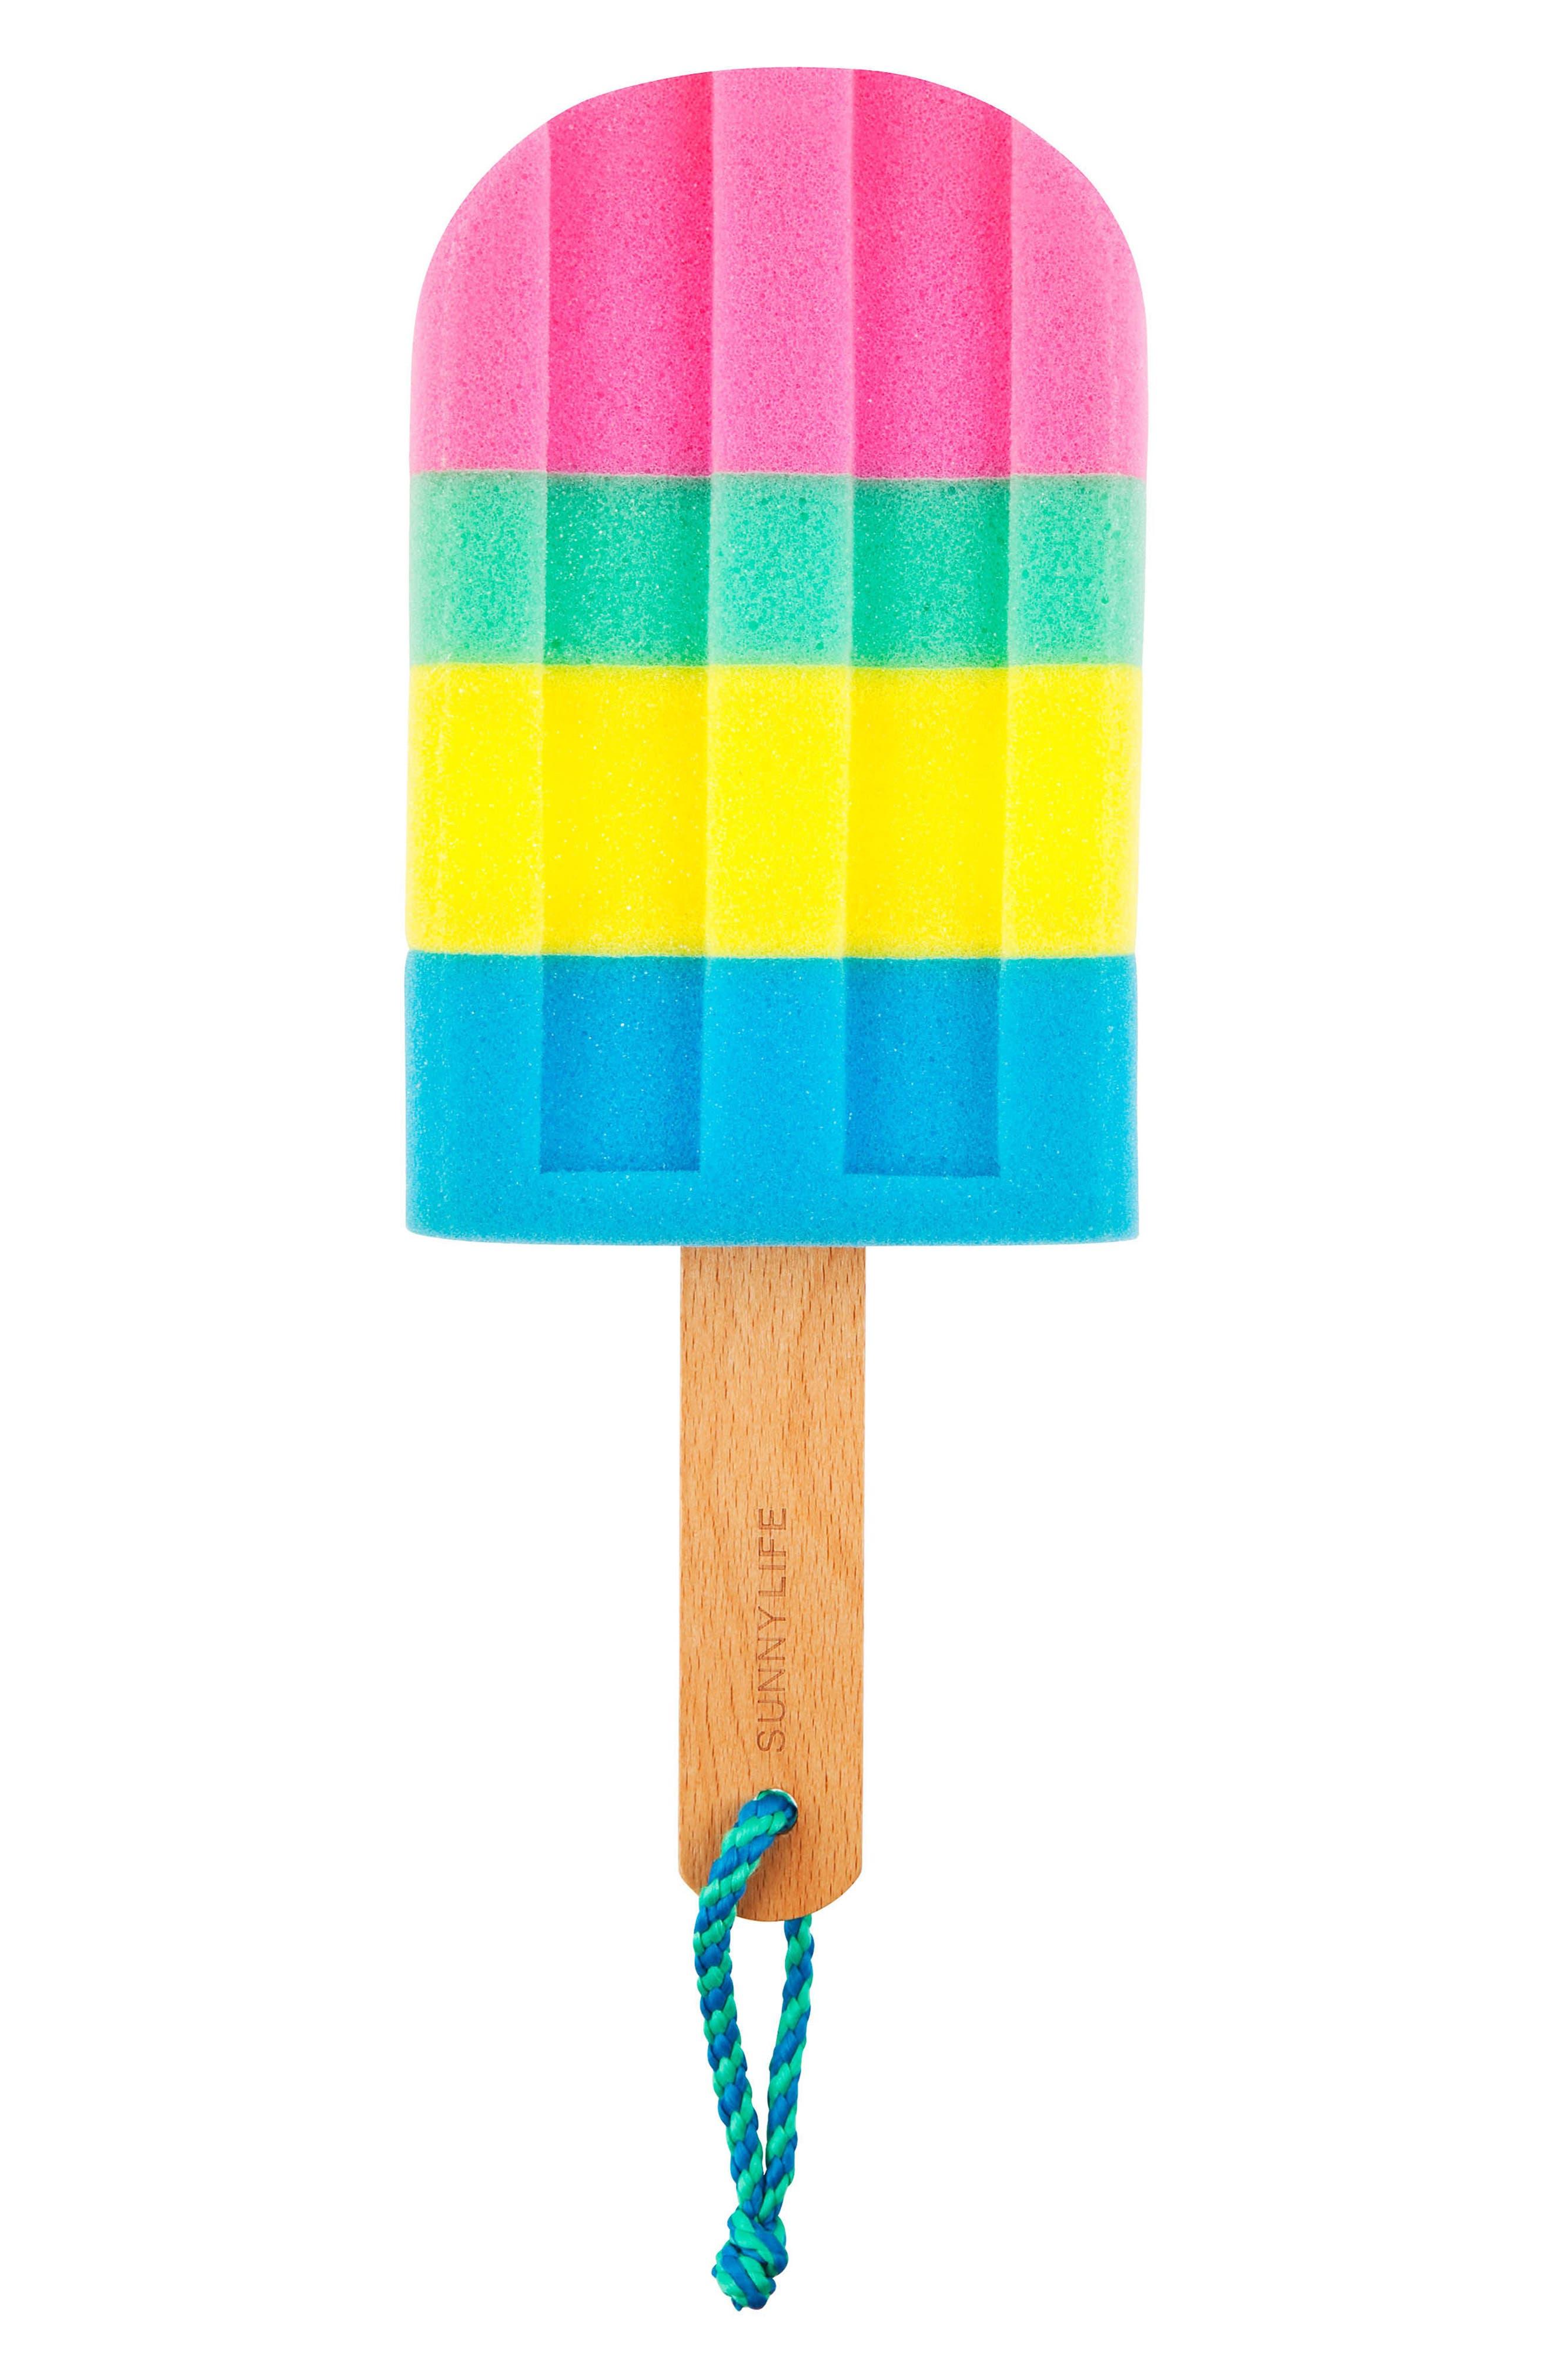 Ice Lolly Bath Sponge,                             Main thumbnail 1, color,